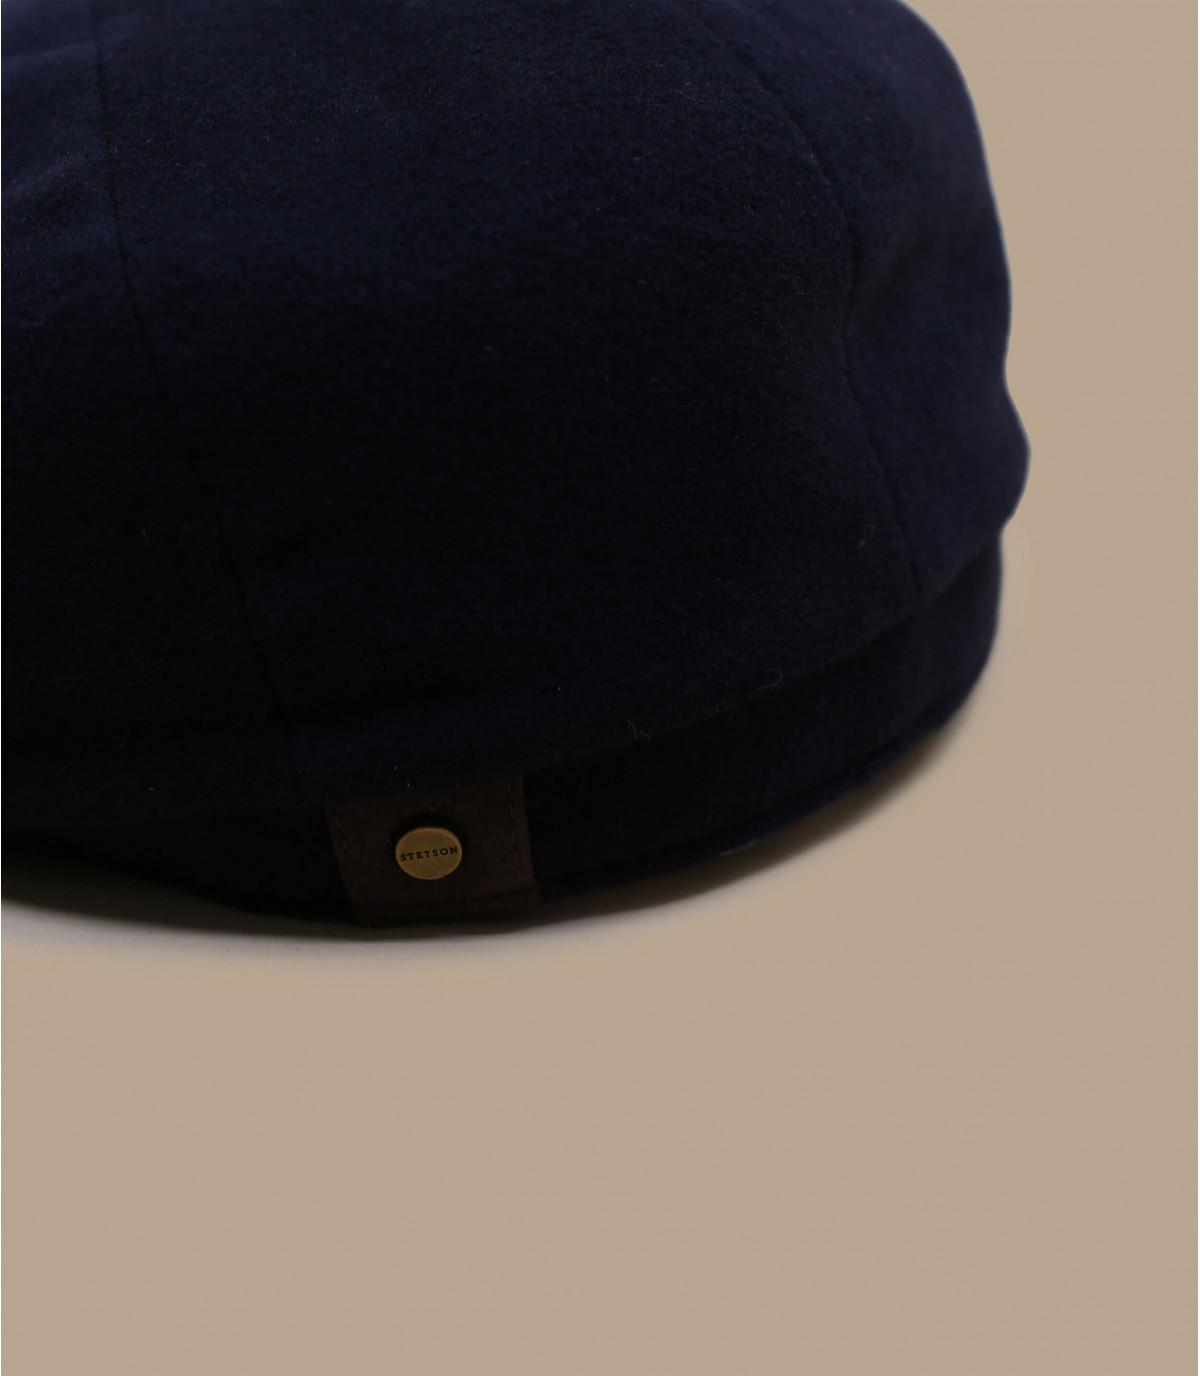 Détails Hatteras Wool Cashmere navy - image 2